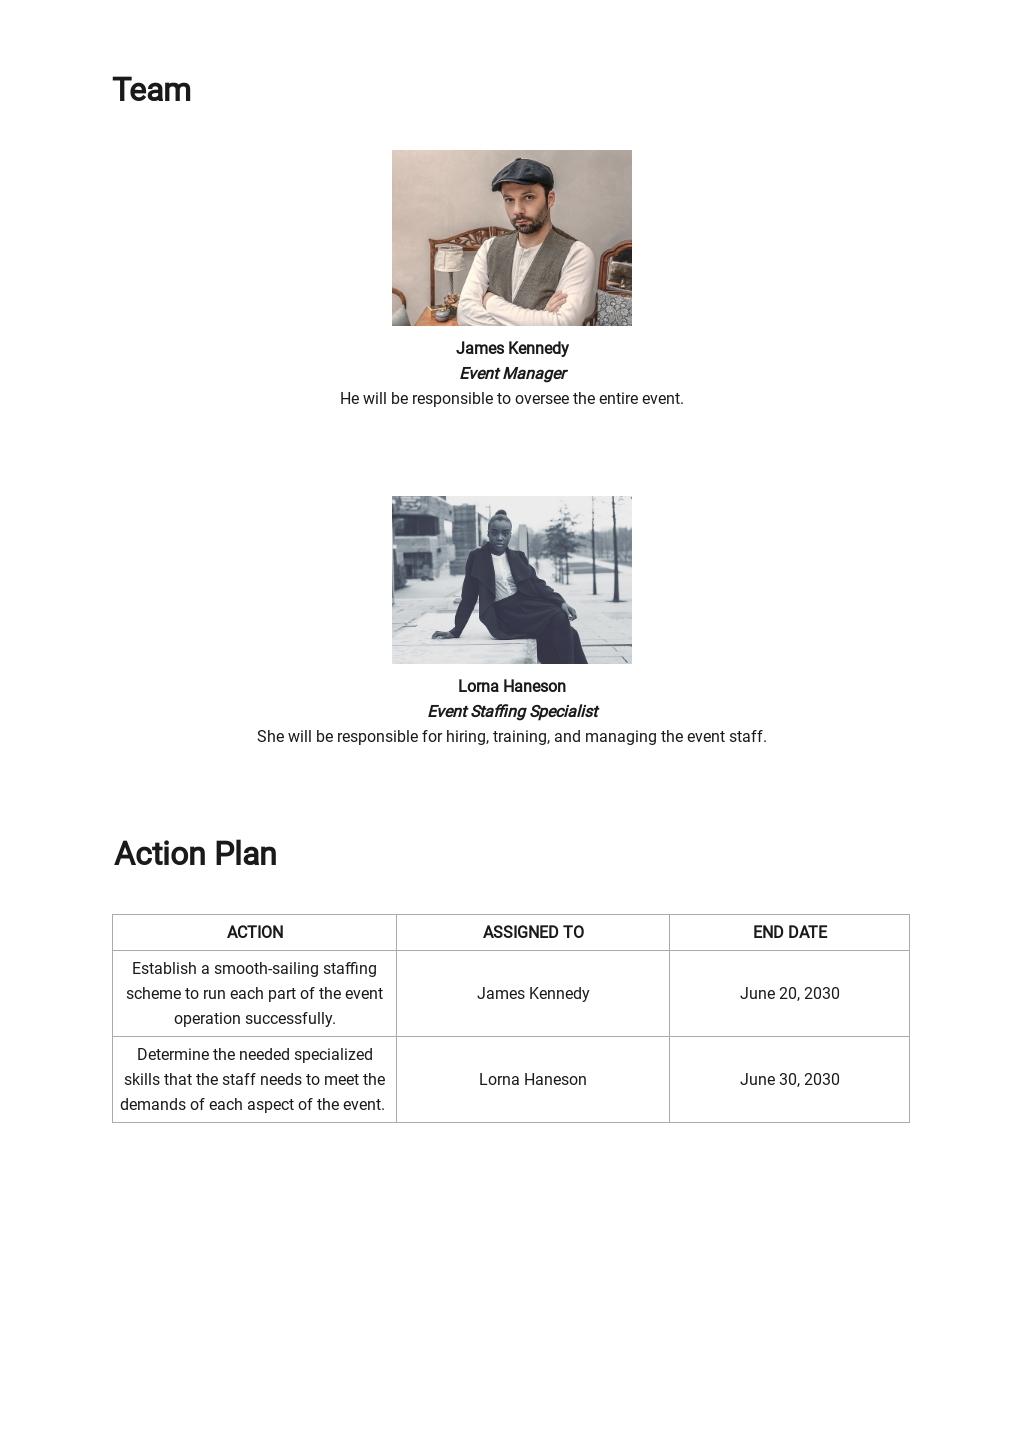 Event Staffing Plan Template 2.jpe